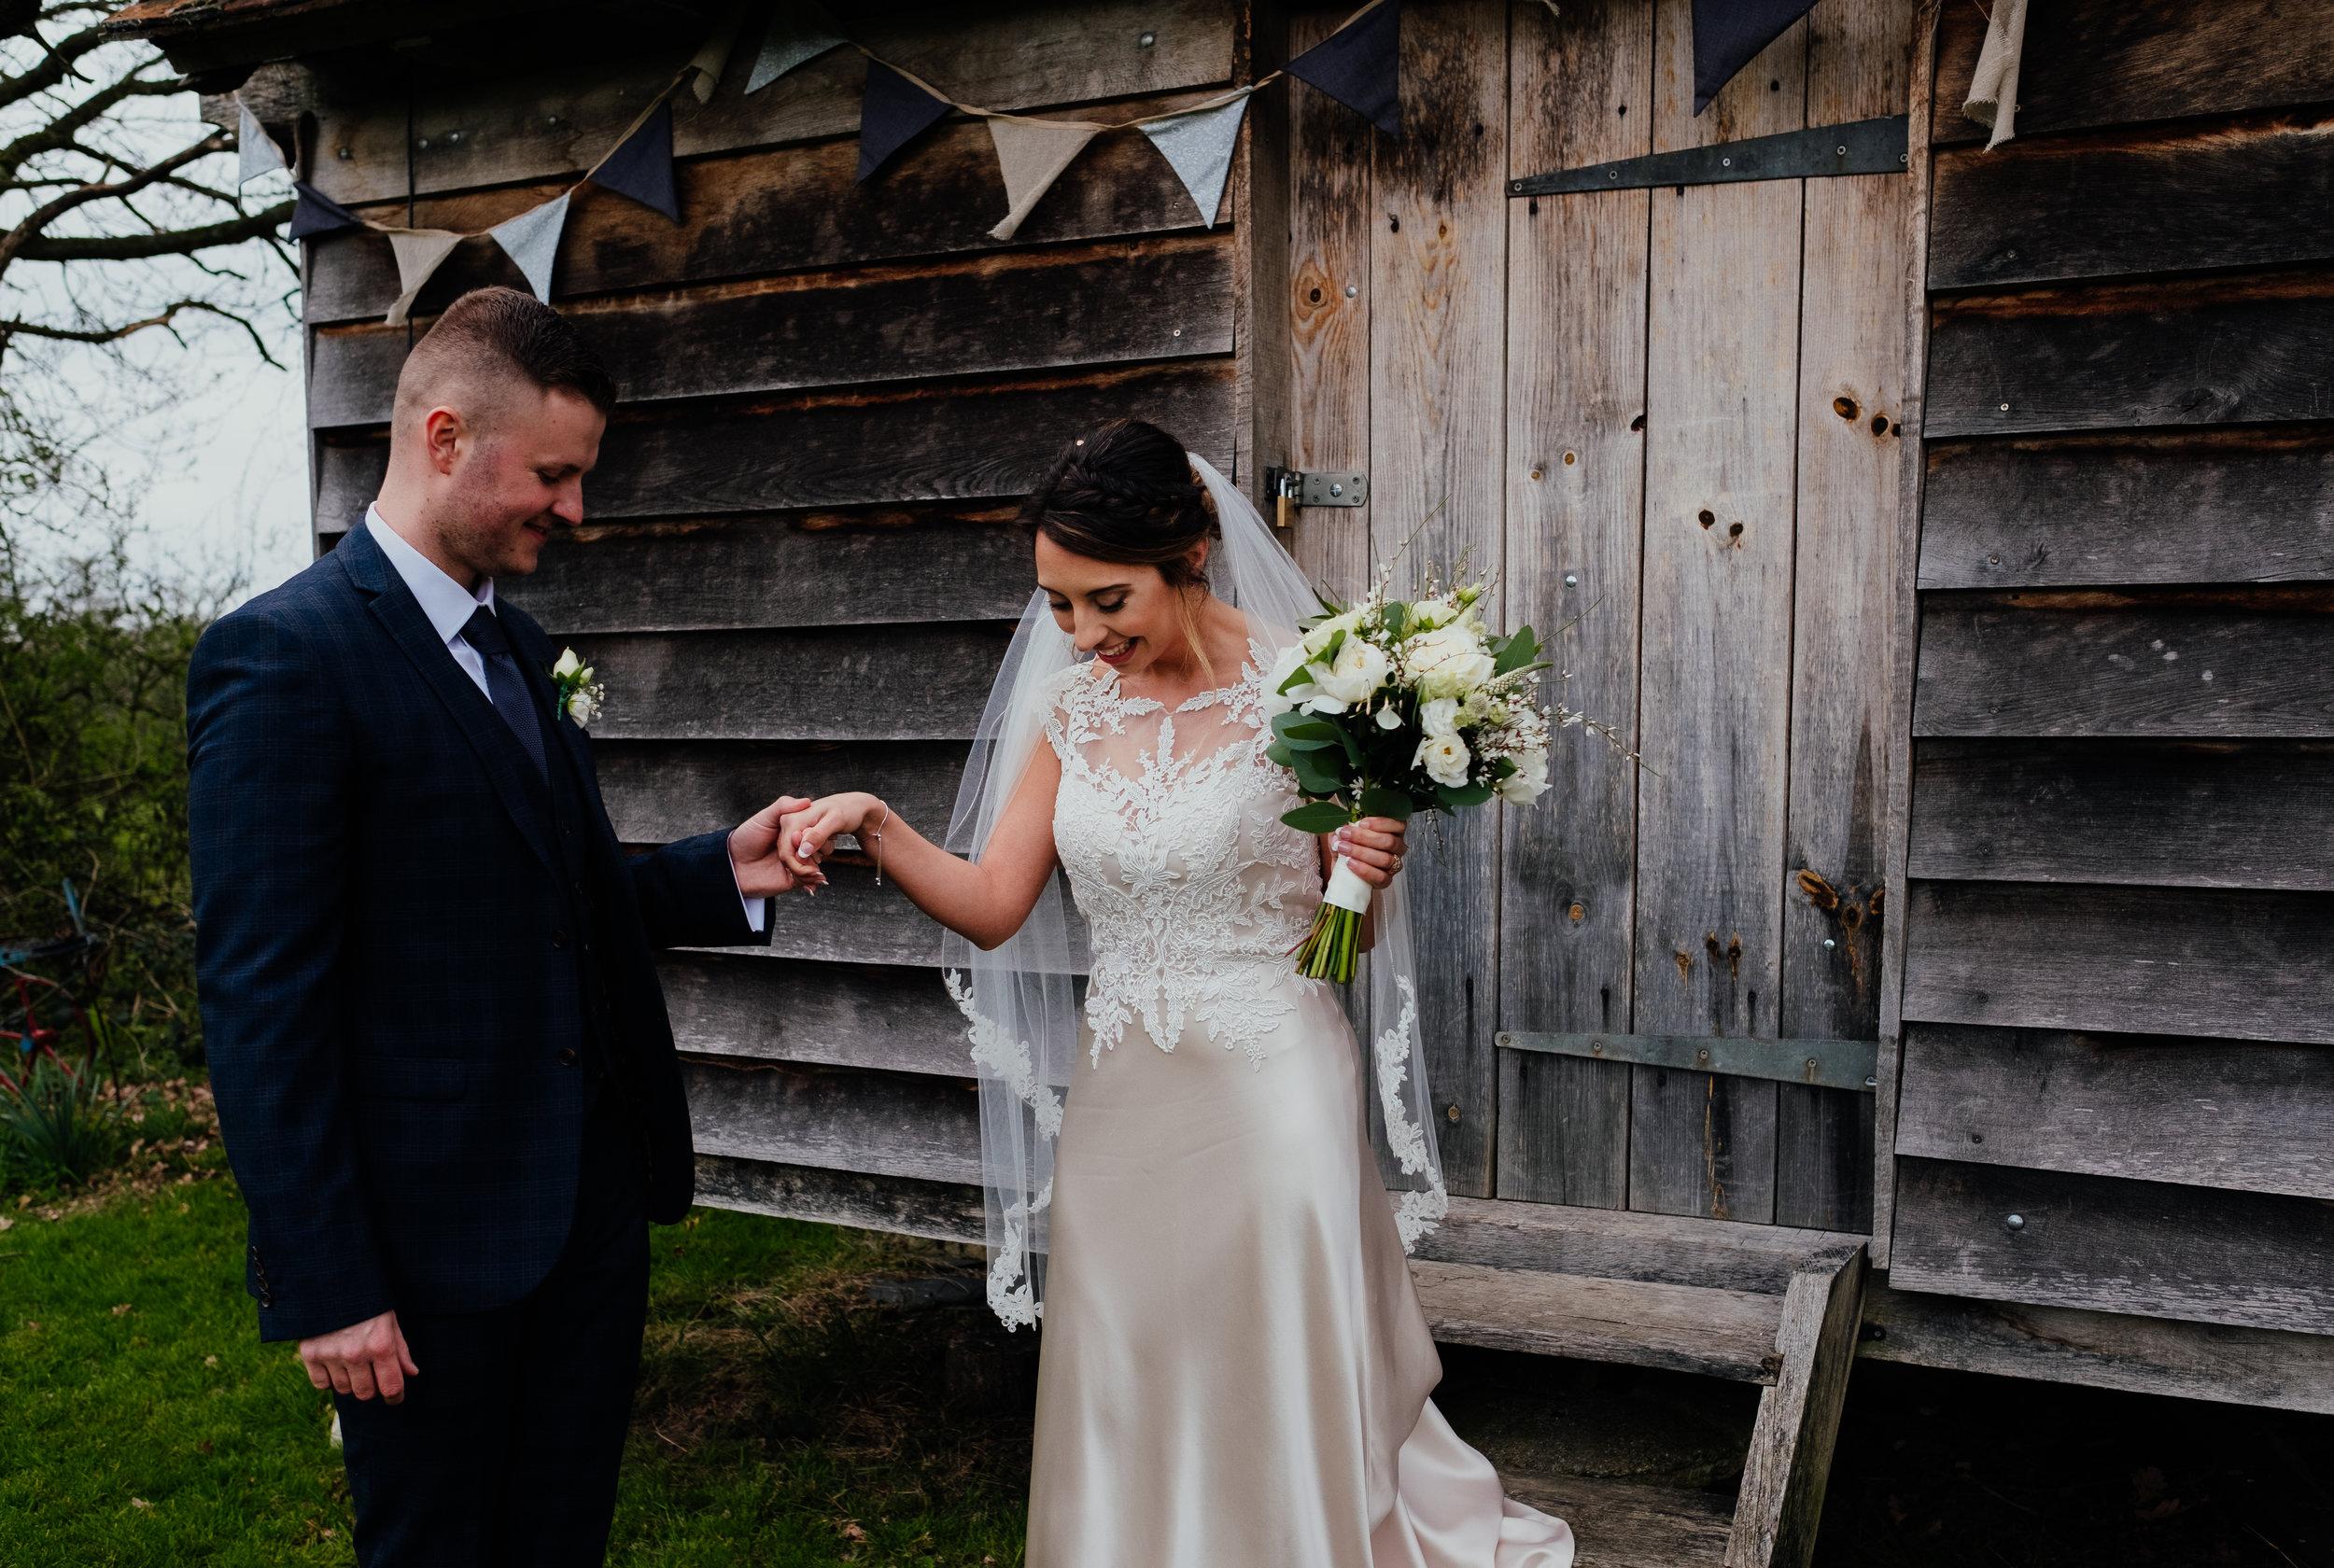 Bride and Groom wedding photography at Gildings Barn